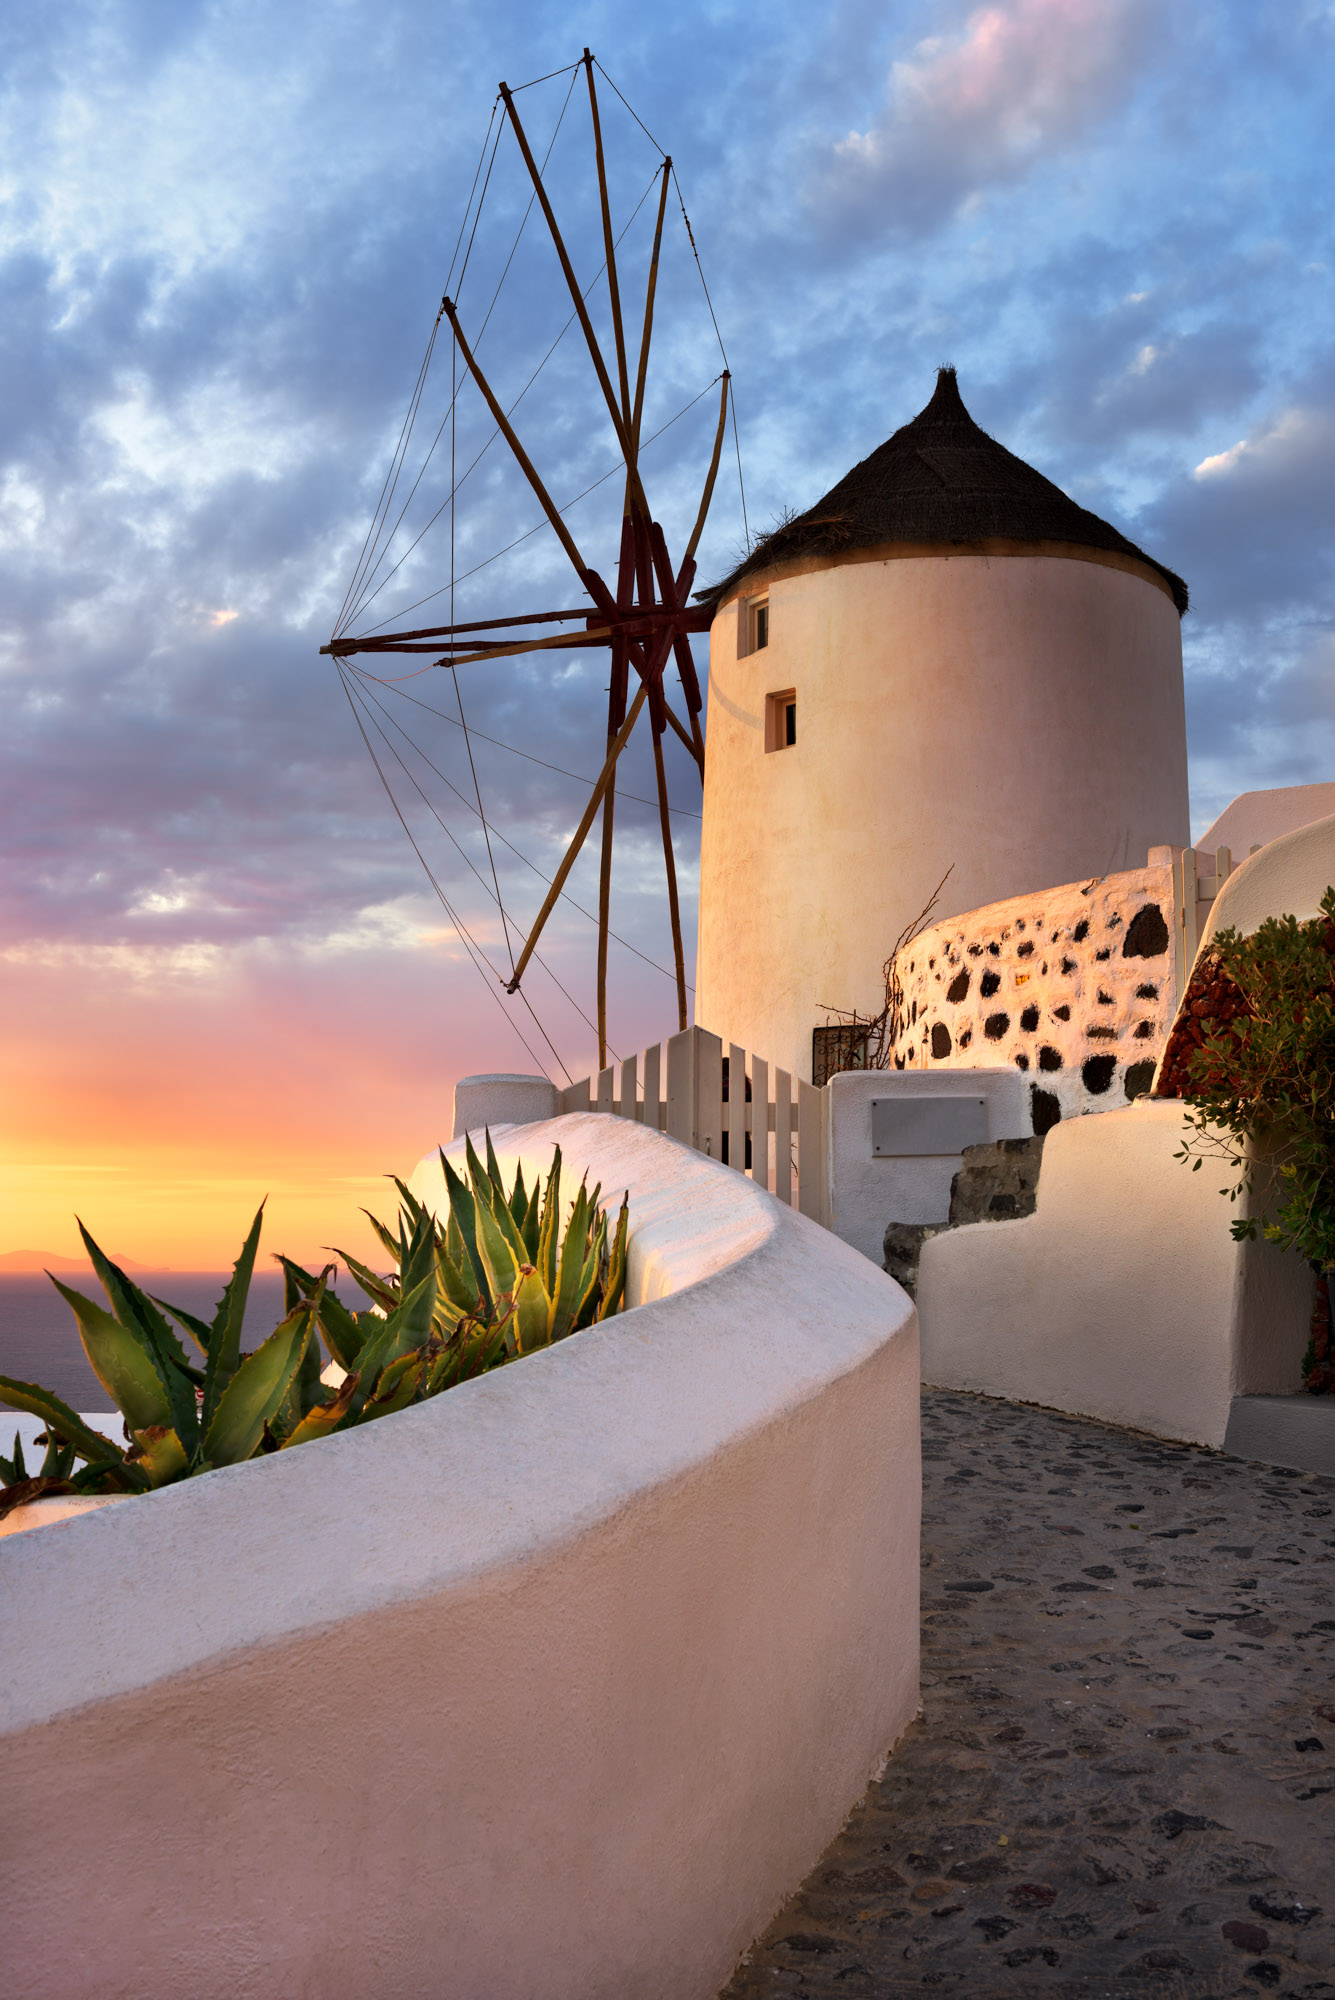 Windmill in Oia Village, Santorini, Greece